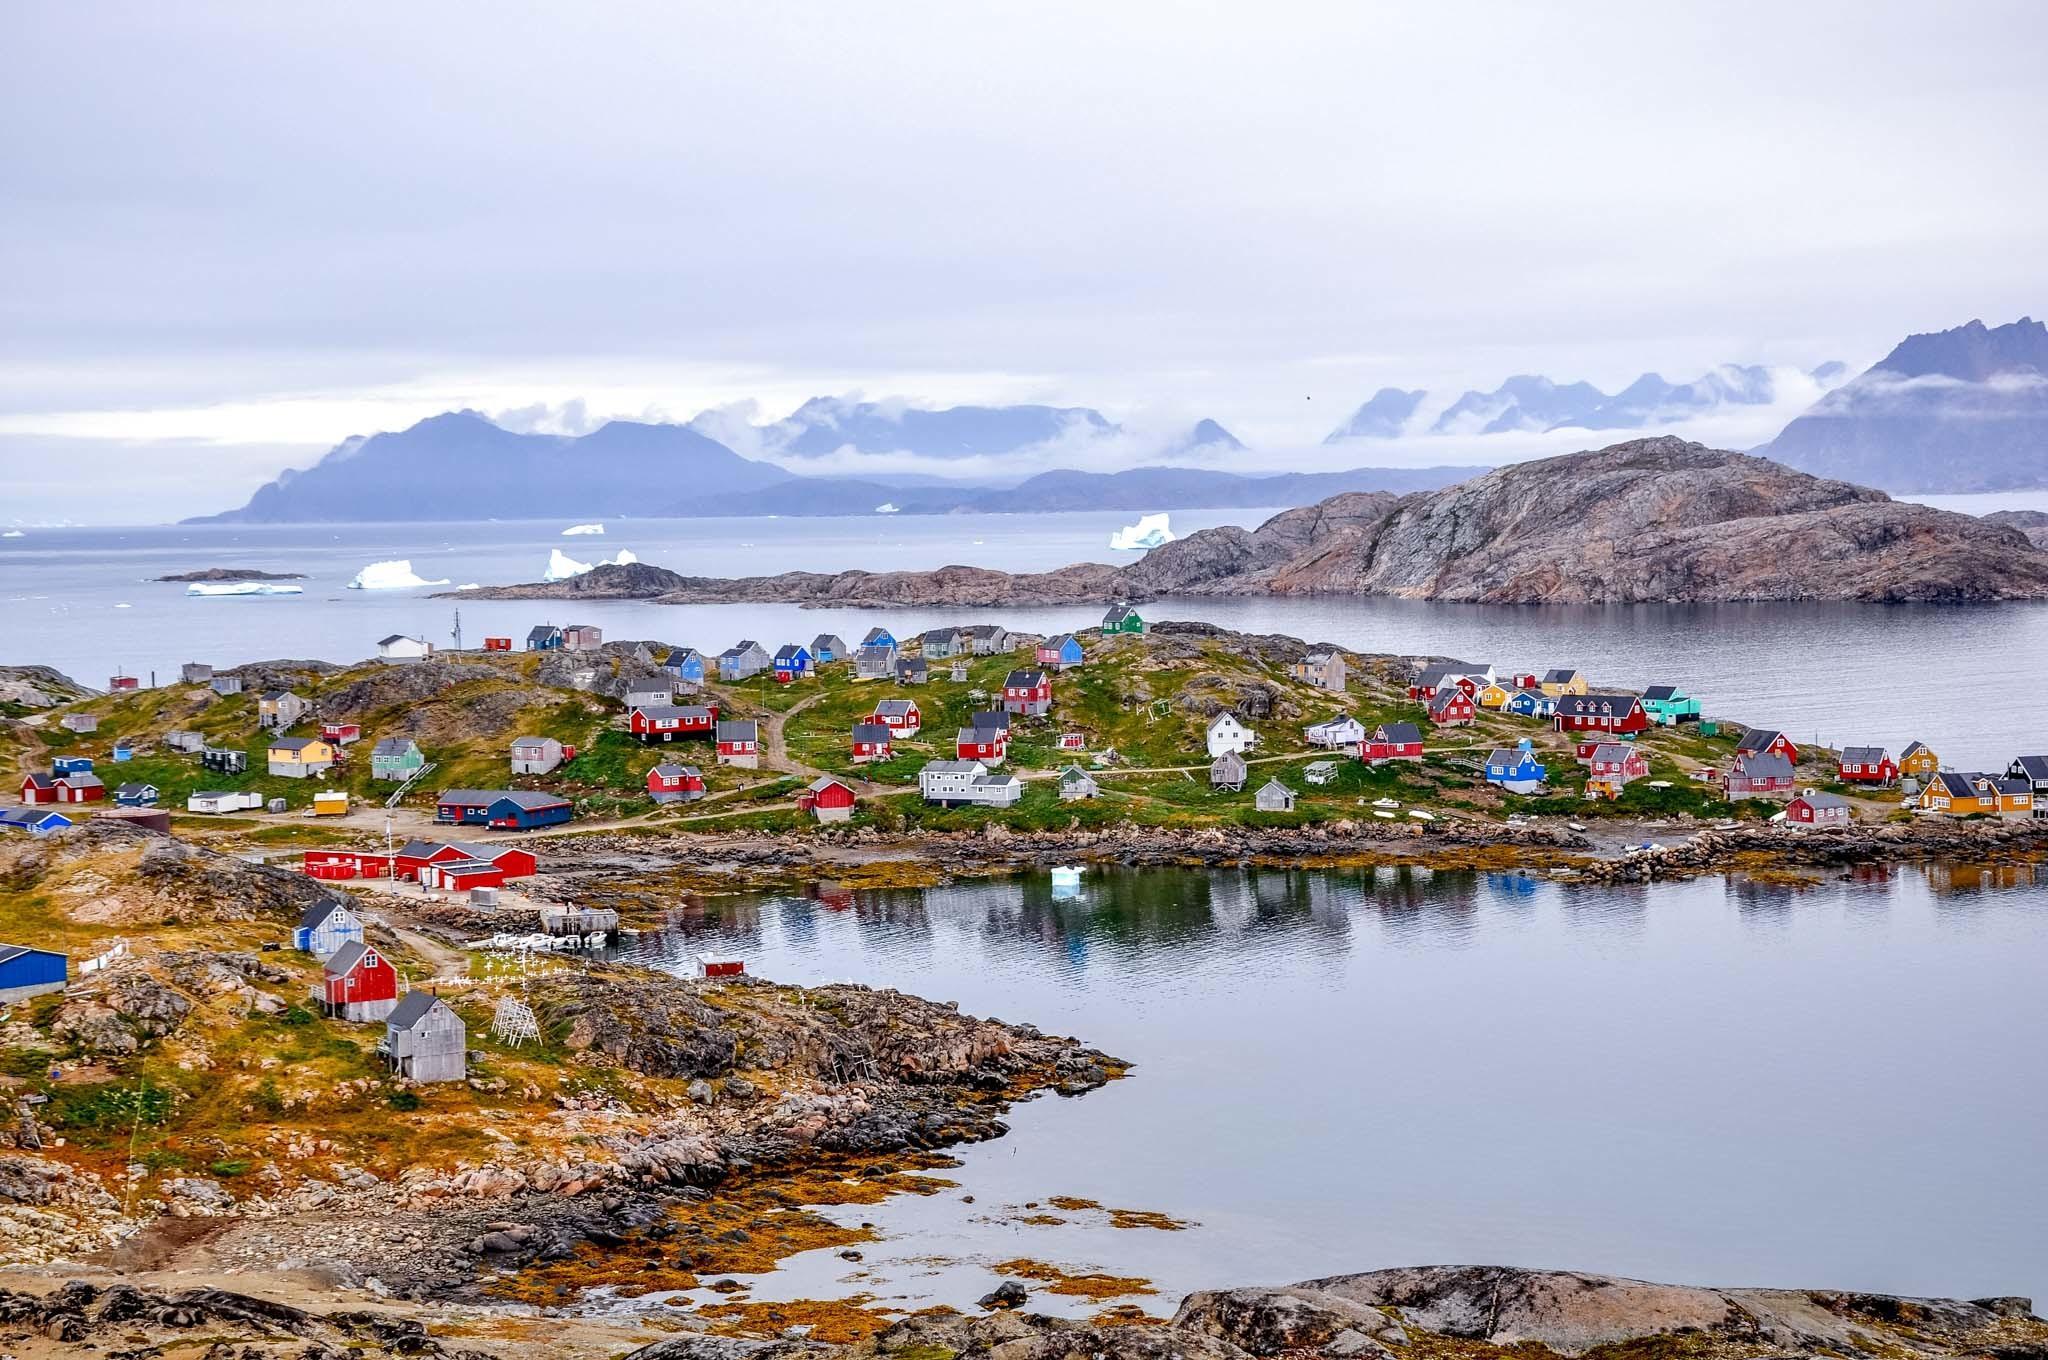 Colorful homes in Kulusuk, Greenland